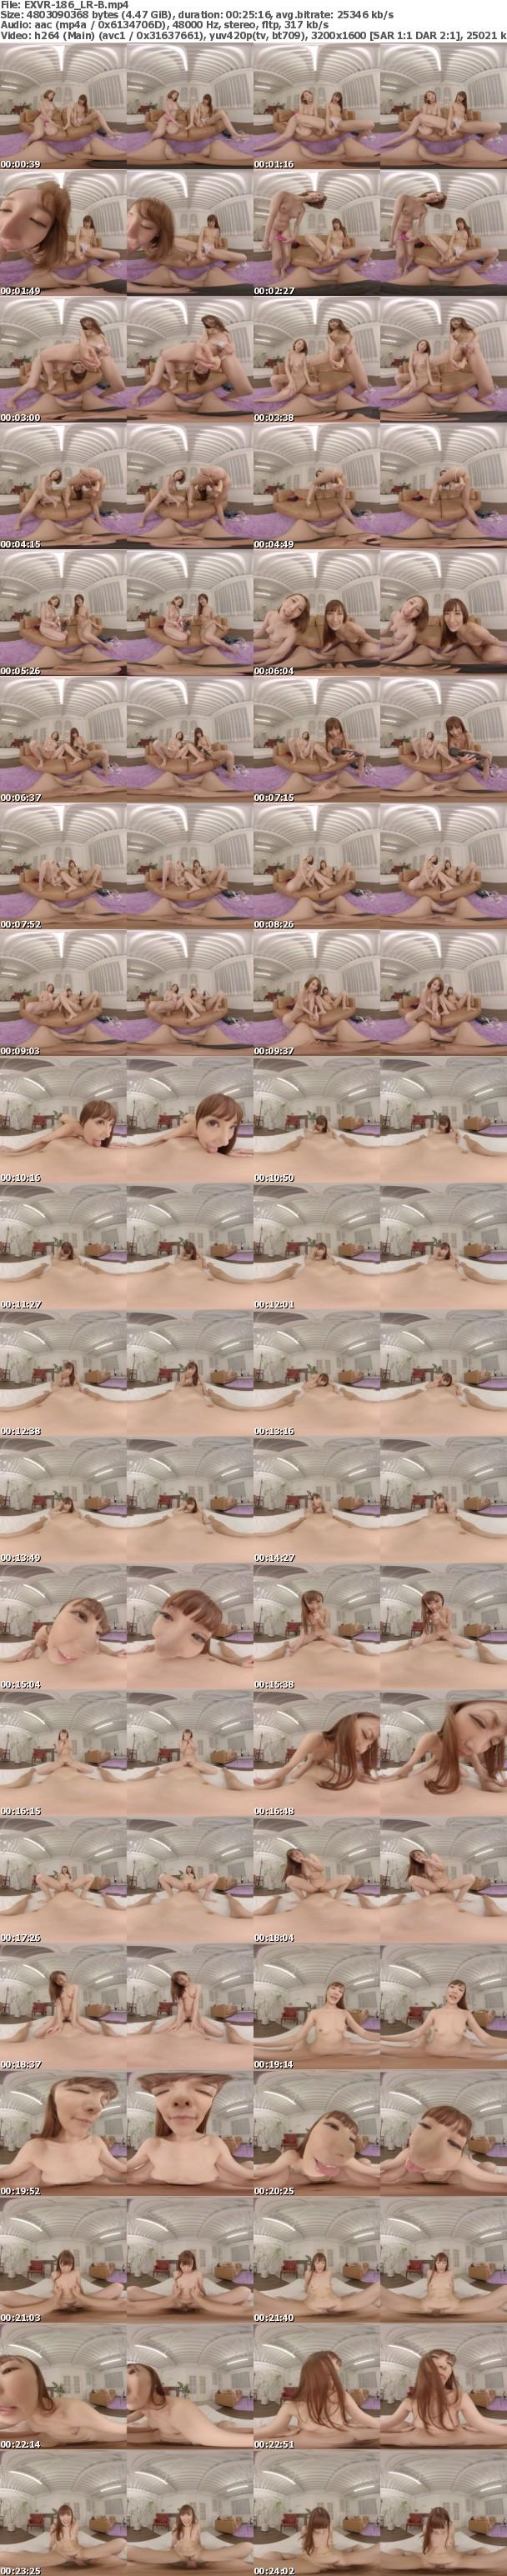 VR/3D EXVR-186 【匠】両隣のエロイお姉さんとほろ酔い王様ゲームでエロエロ連続ナマ中出しSEX! 希咲あや 小峰みこ